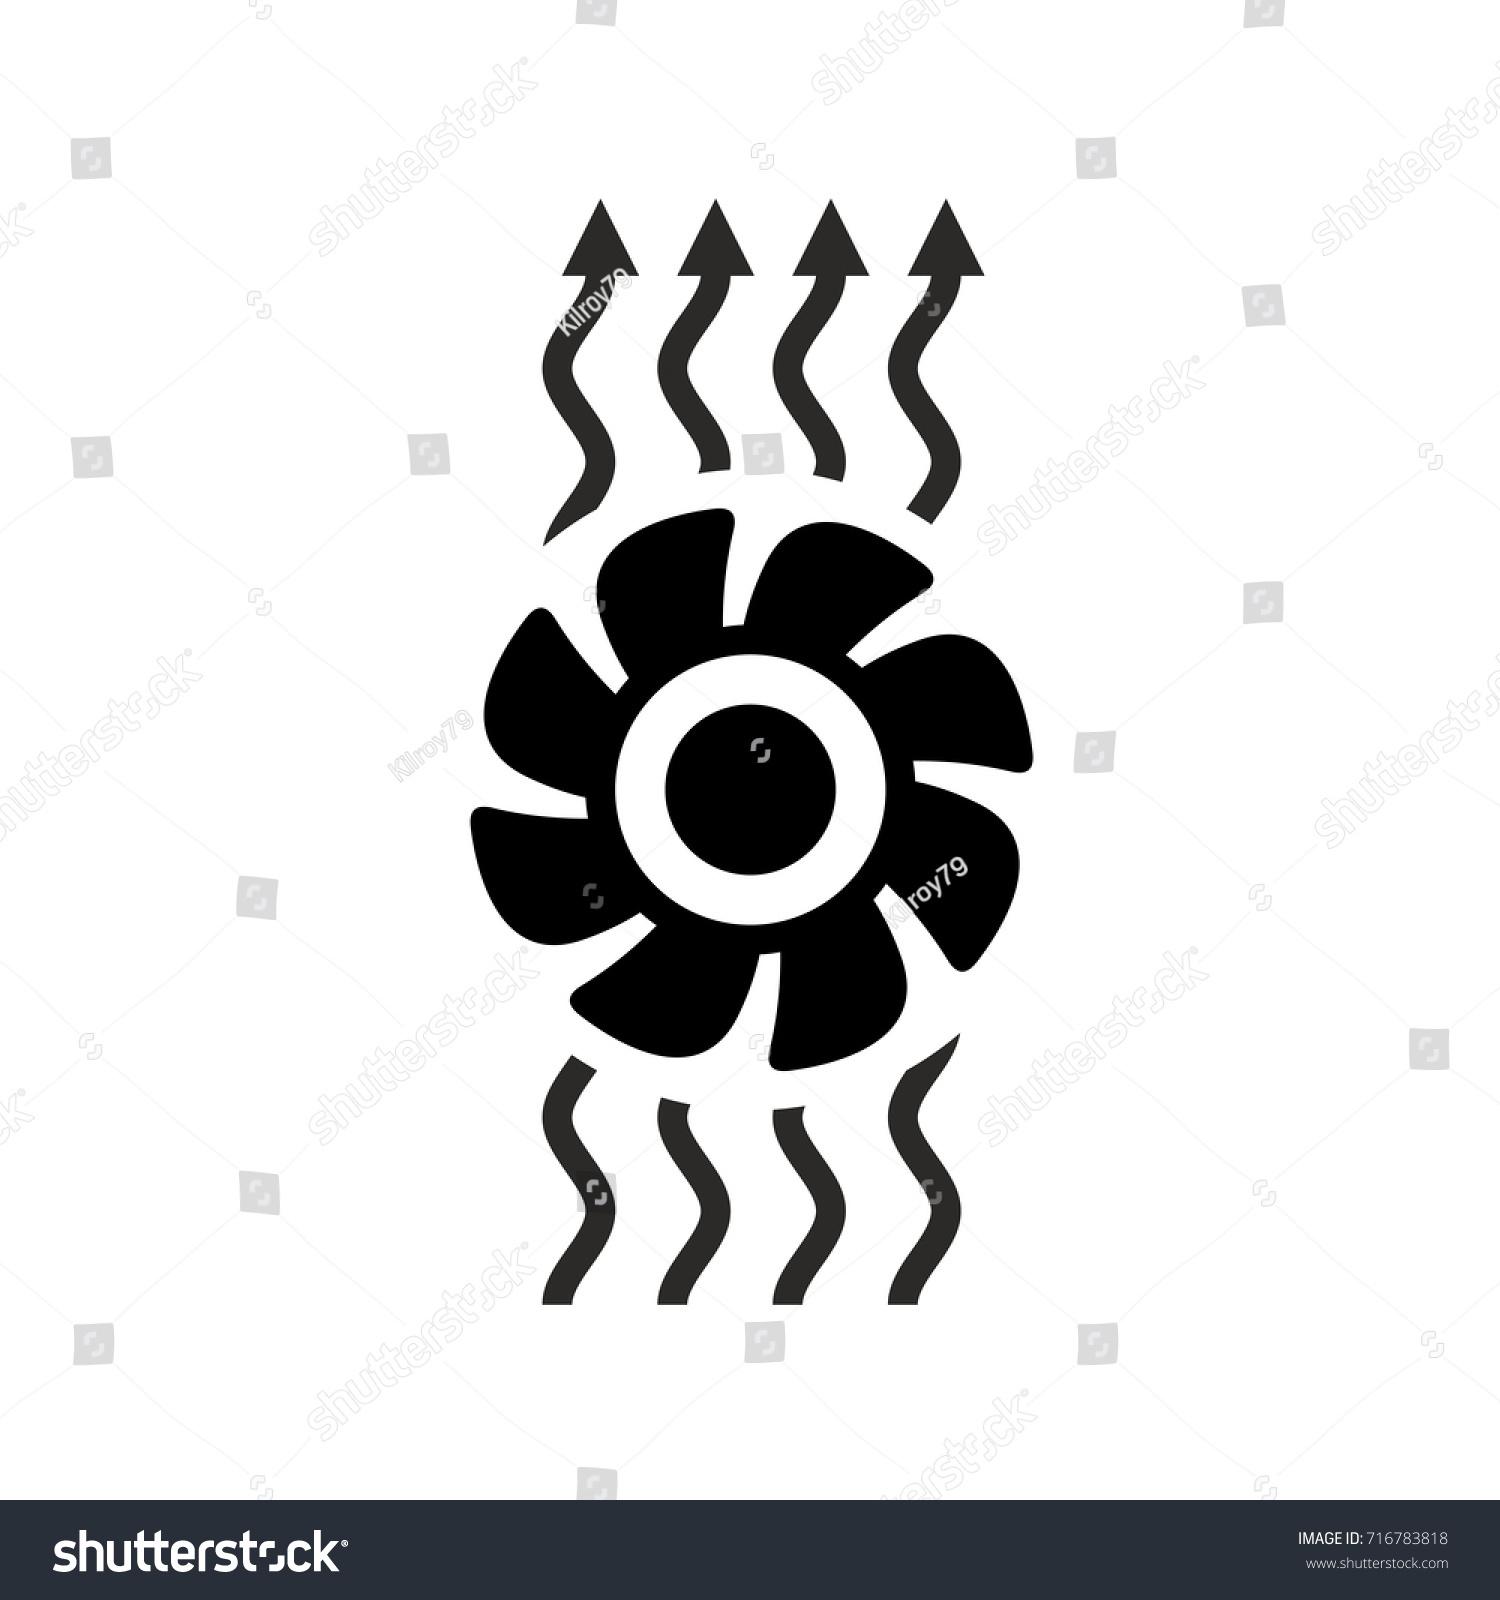 Exhaust Fan Symbol : Ventilation icon fan air waves flow stock vector